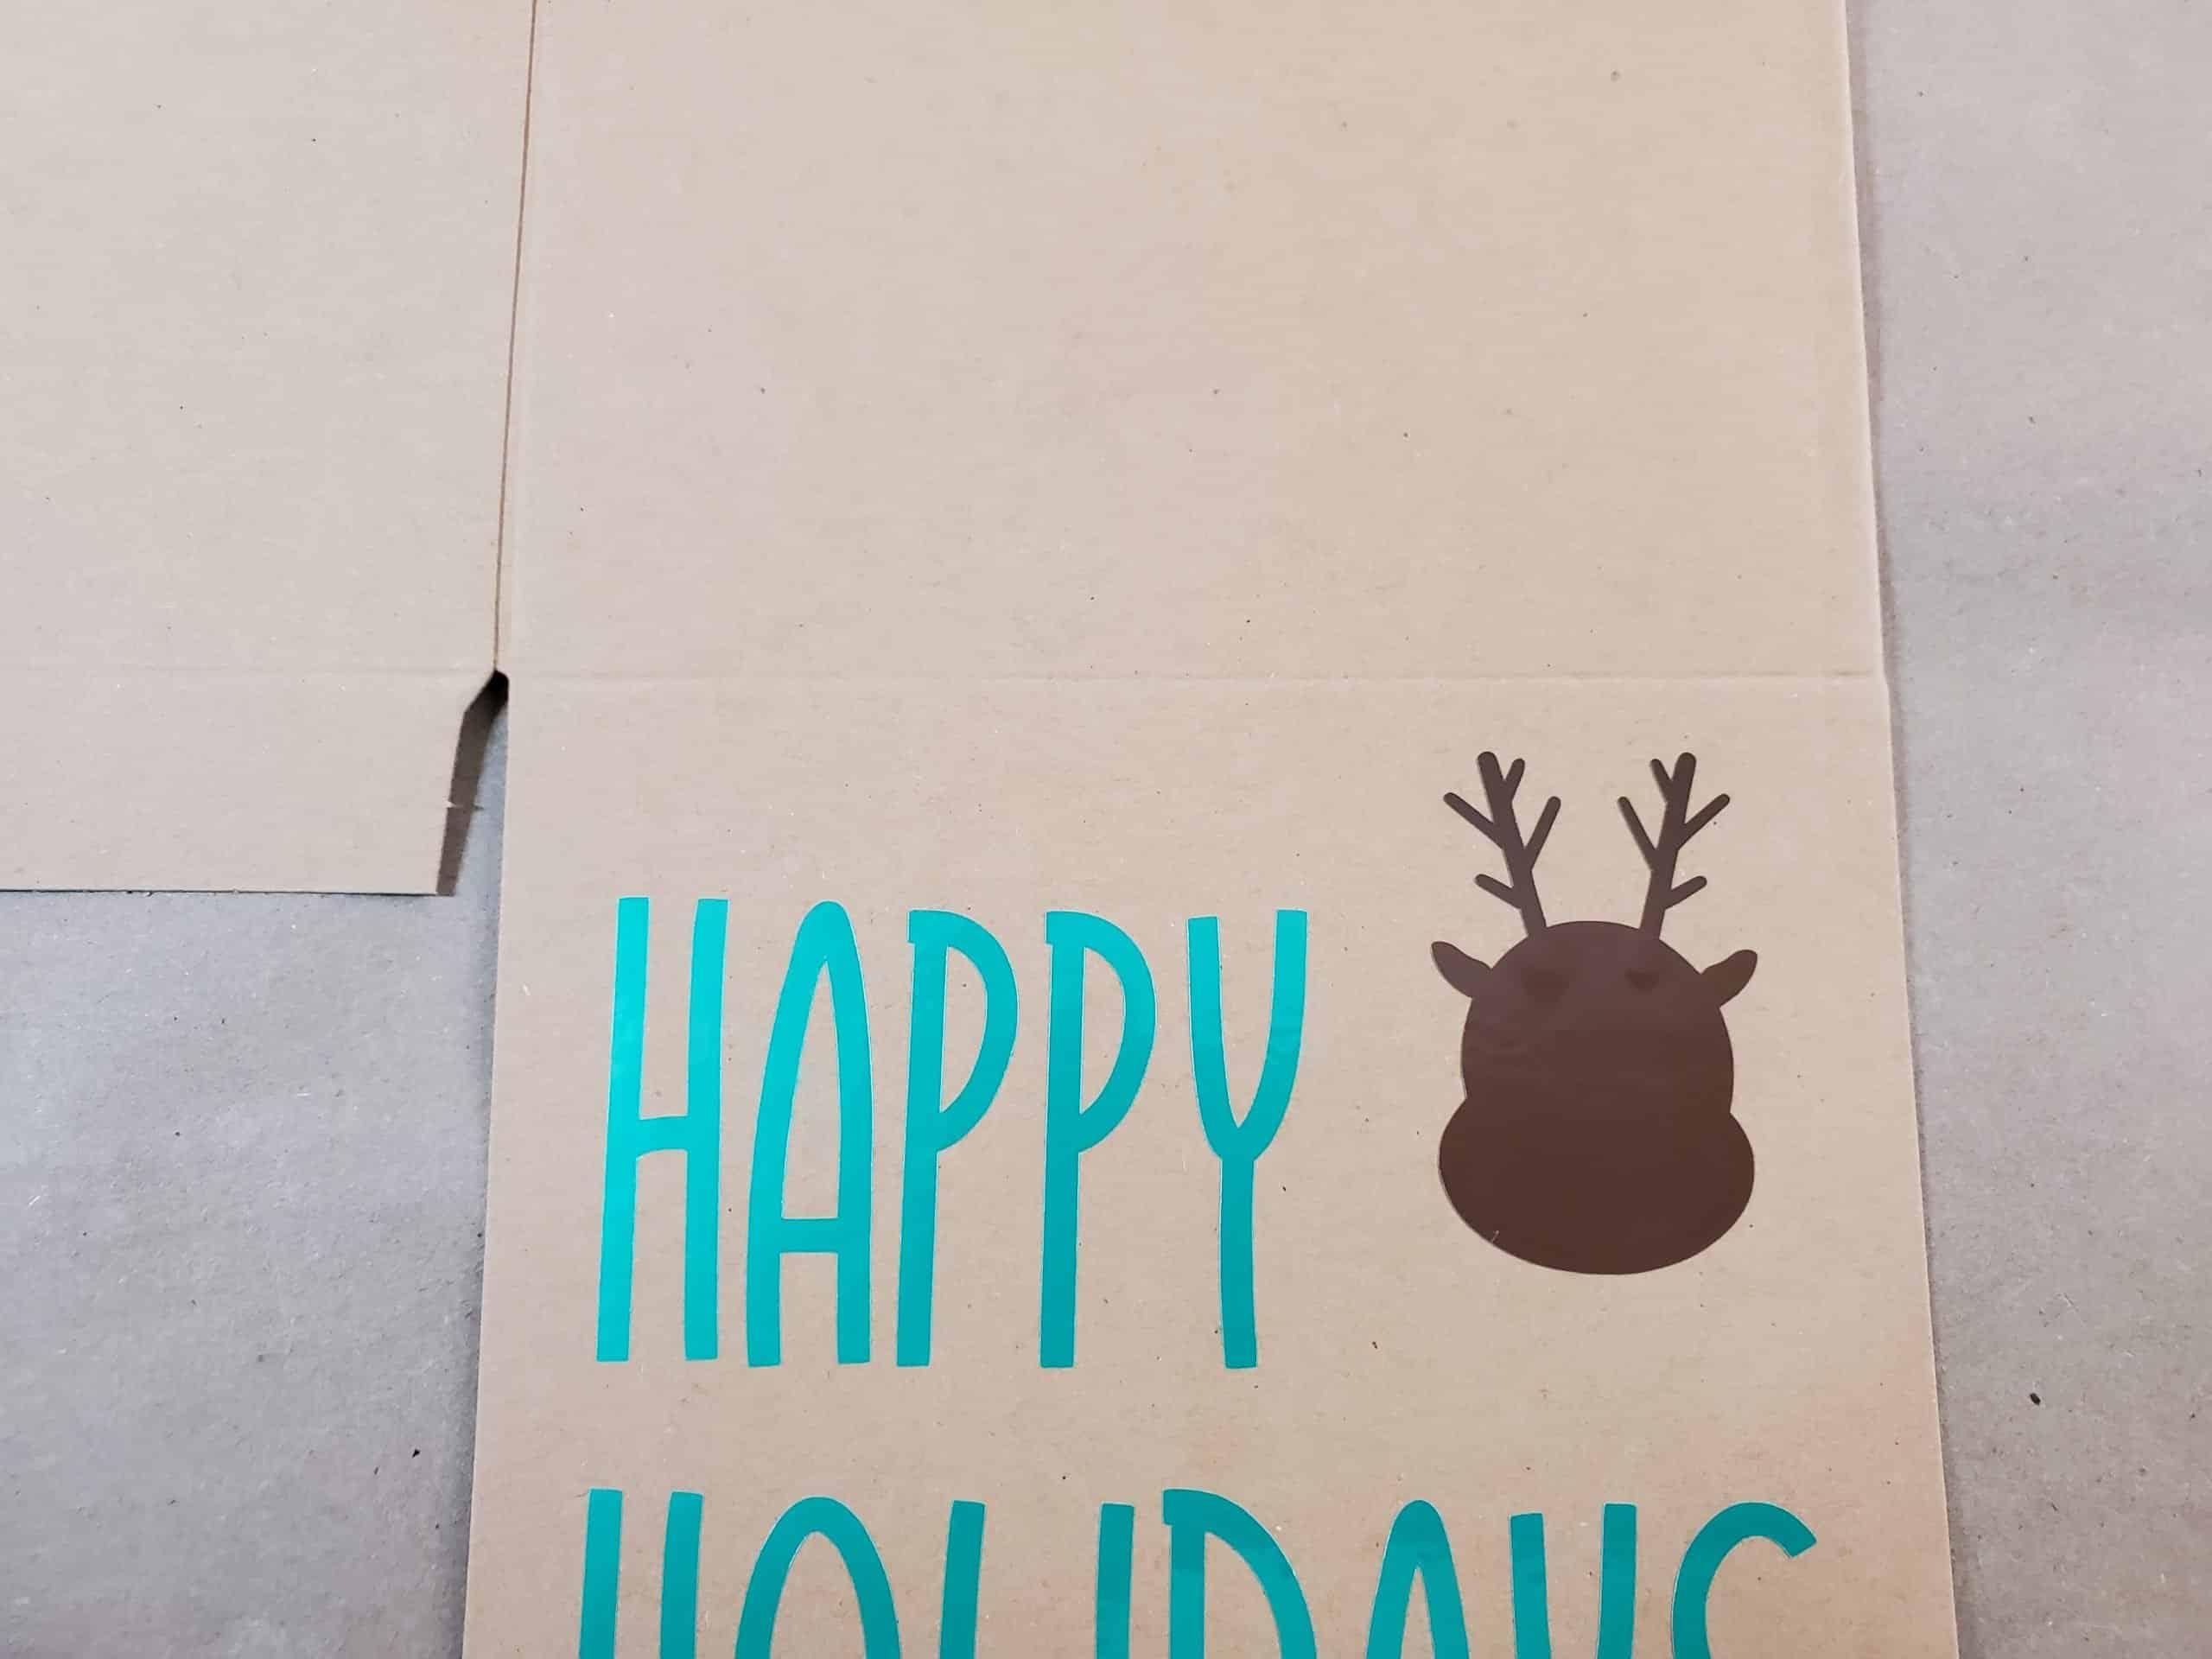 Reindeer Head and Antlers on Box